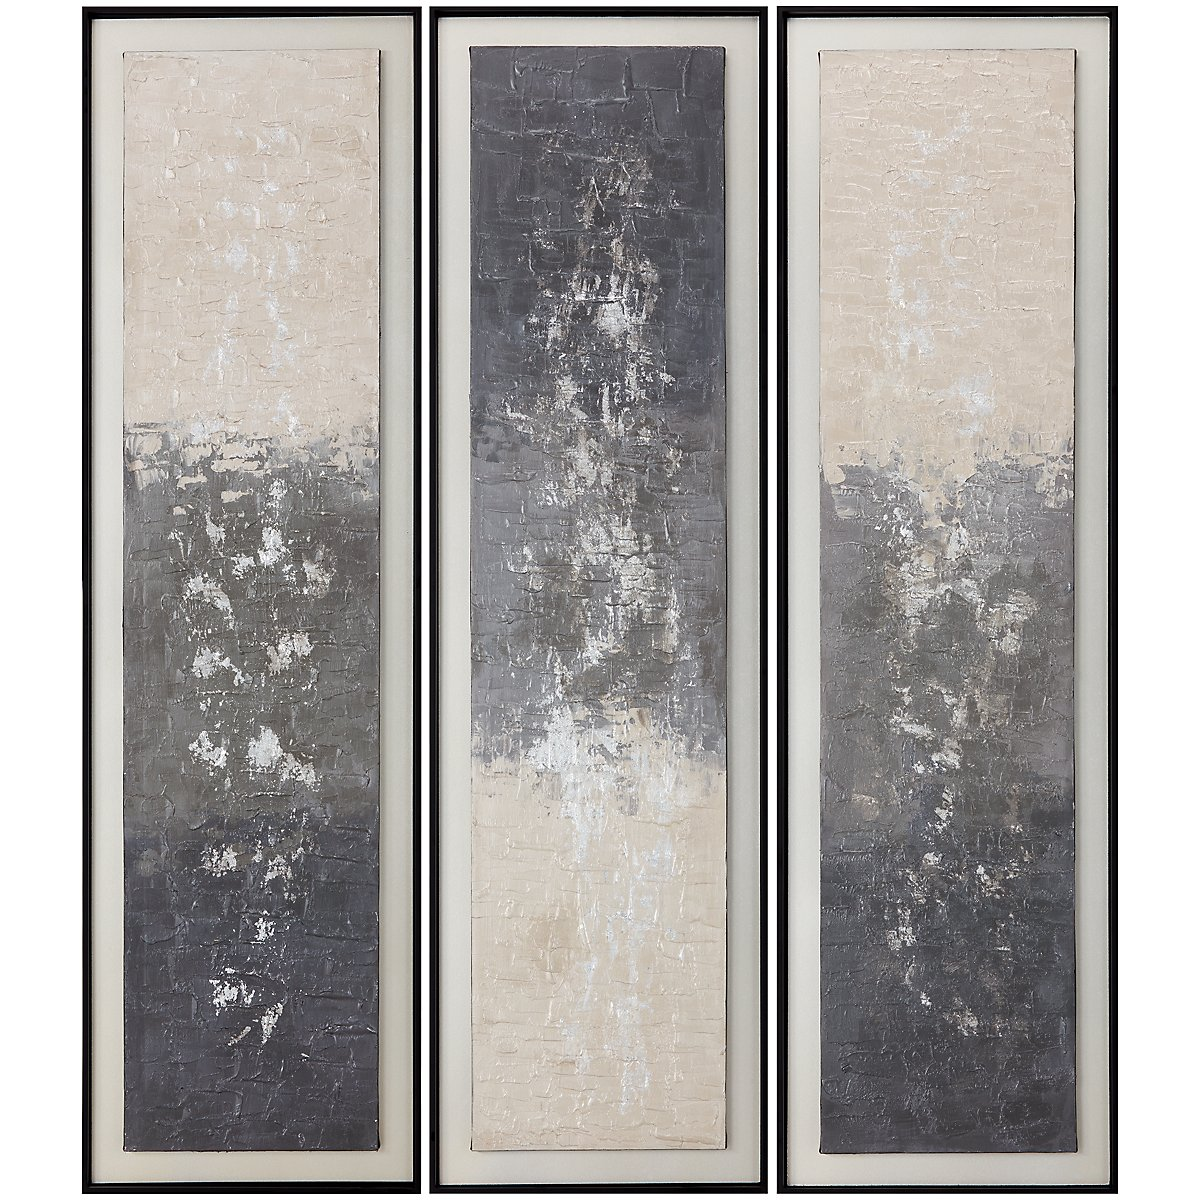 Nordic Gray Set Of 3 Framed Wall Art